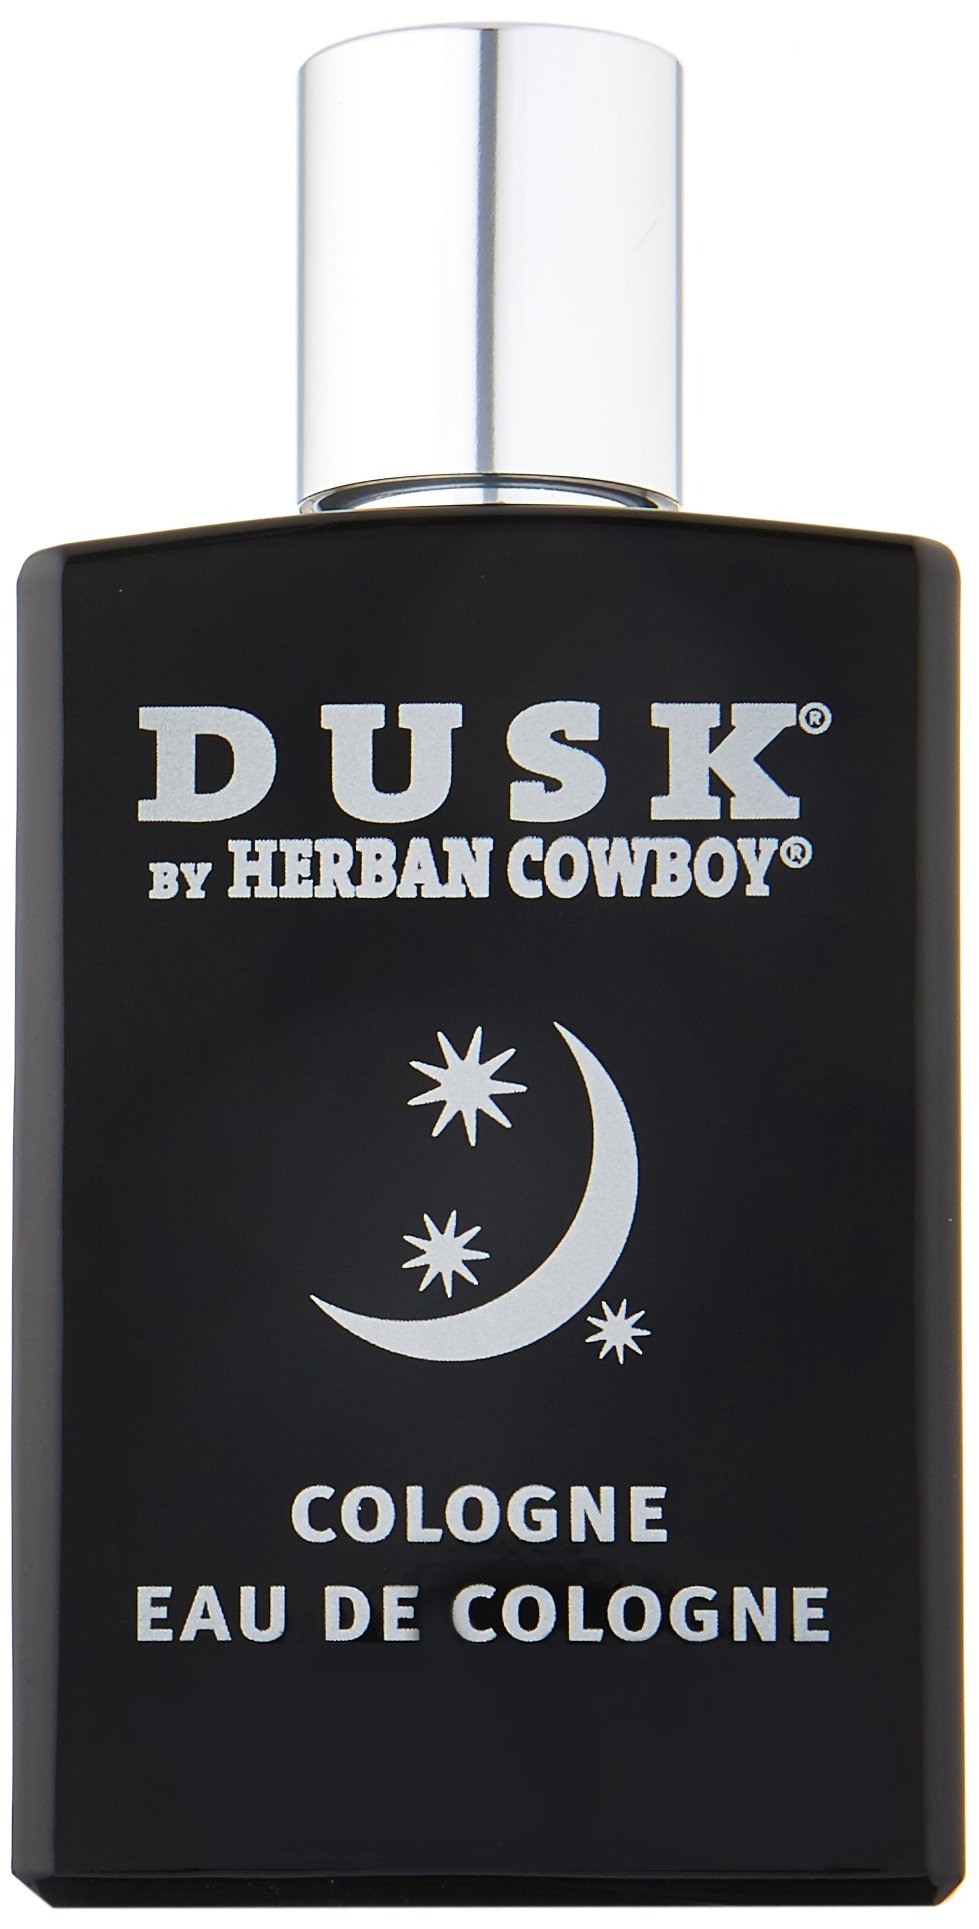 Herban Cowboy Natural Grooming Cologne - Dusk 1.7 fl oz Liquid